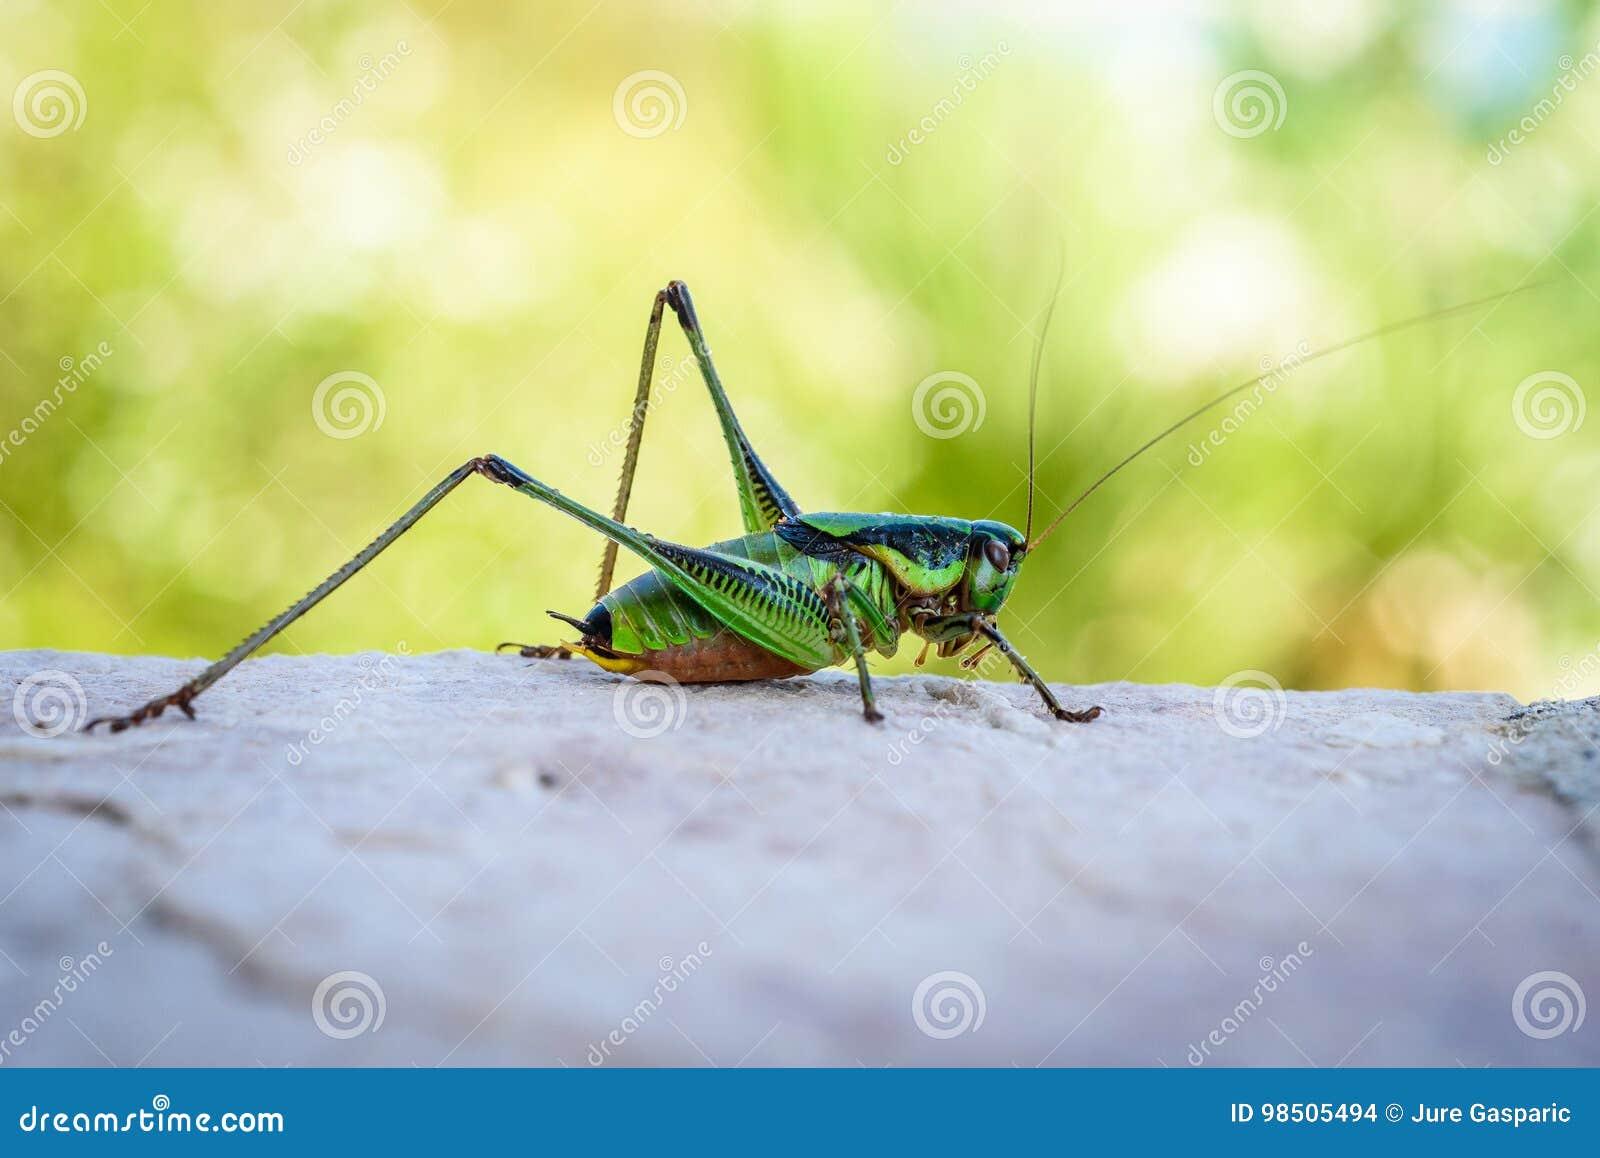 Green grasshopper or locust macro shot on a outdoor terrace.